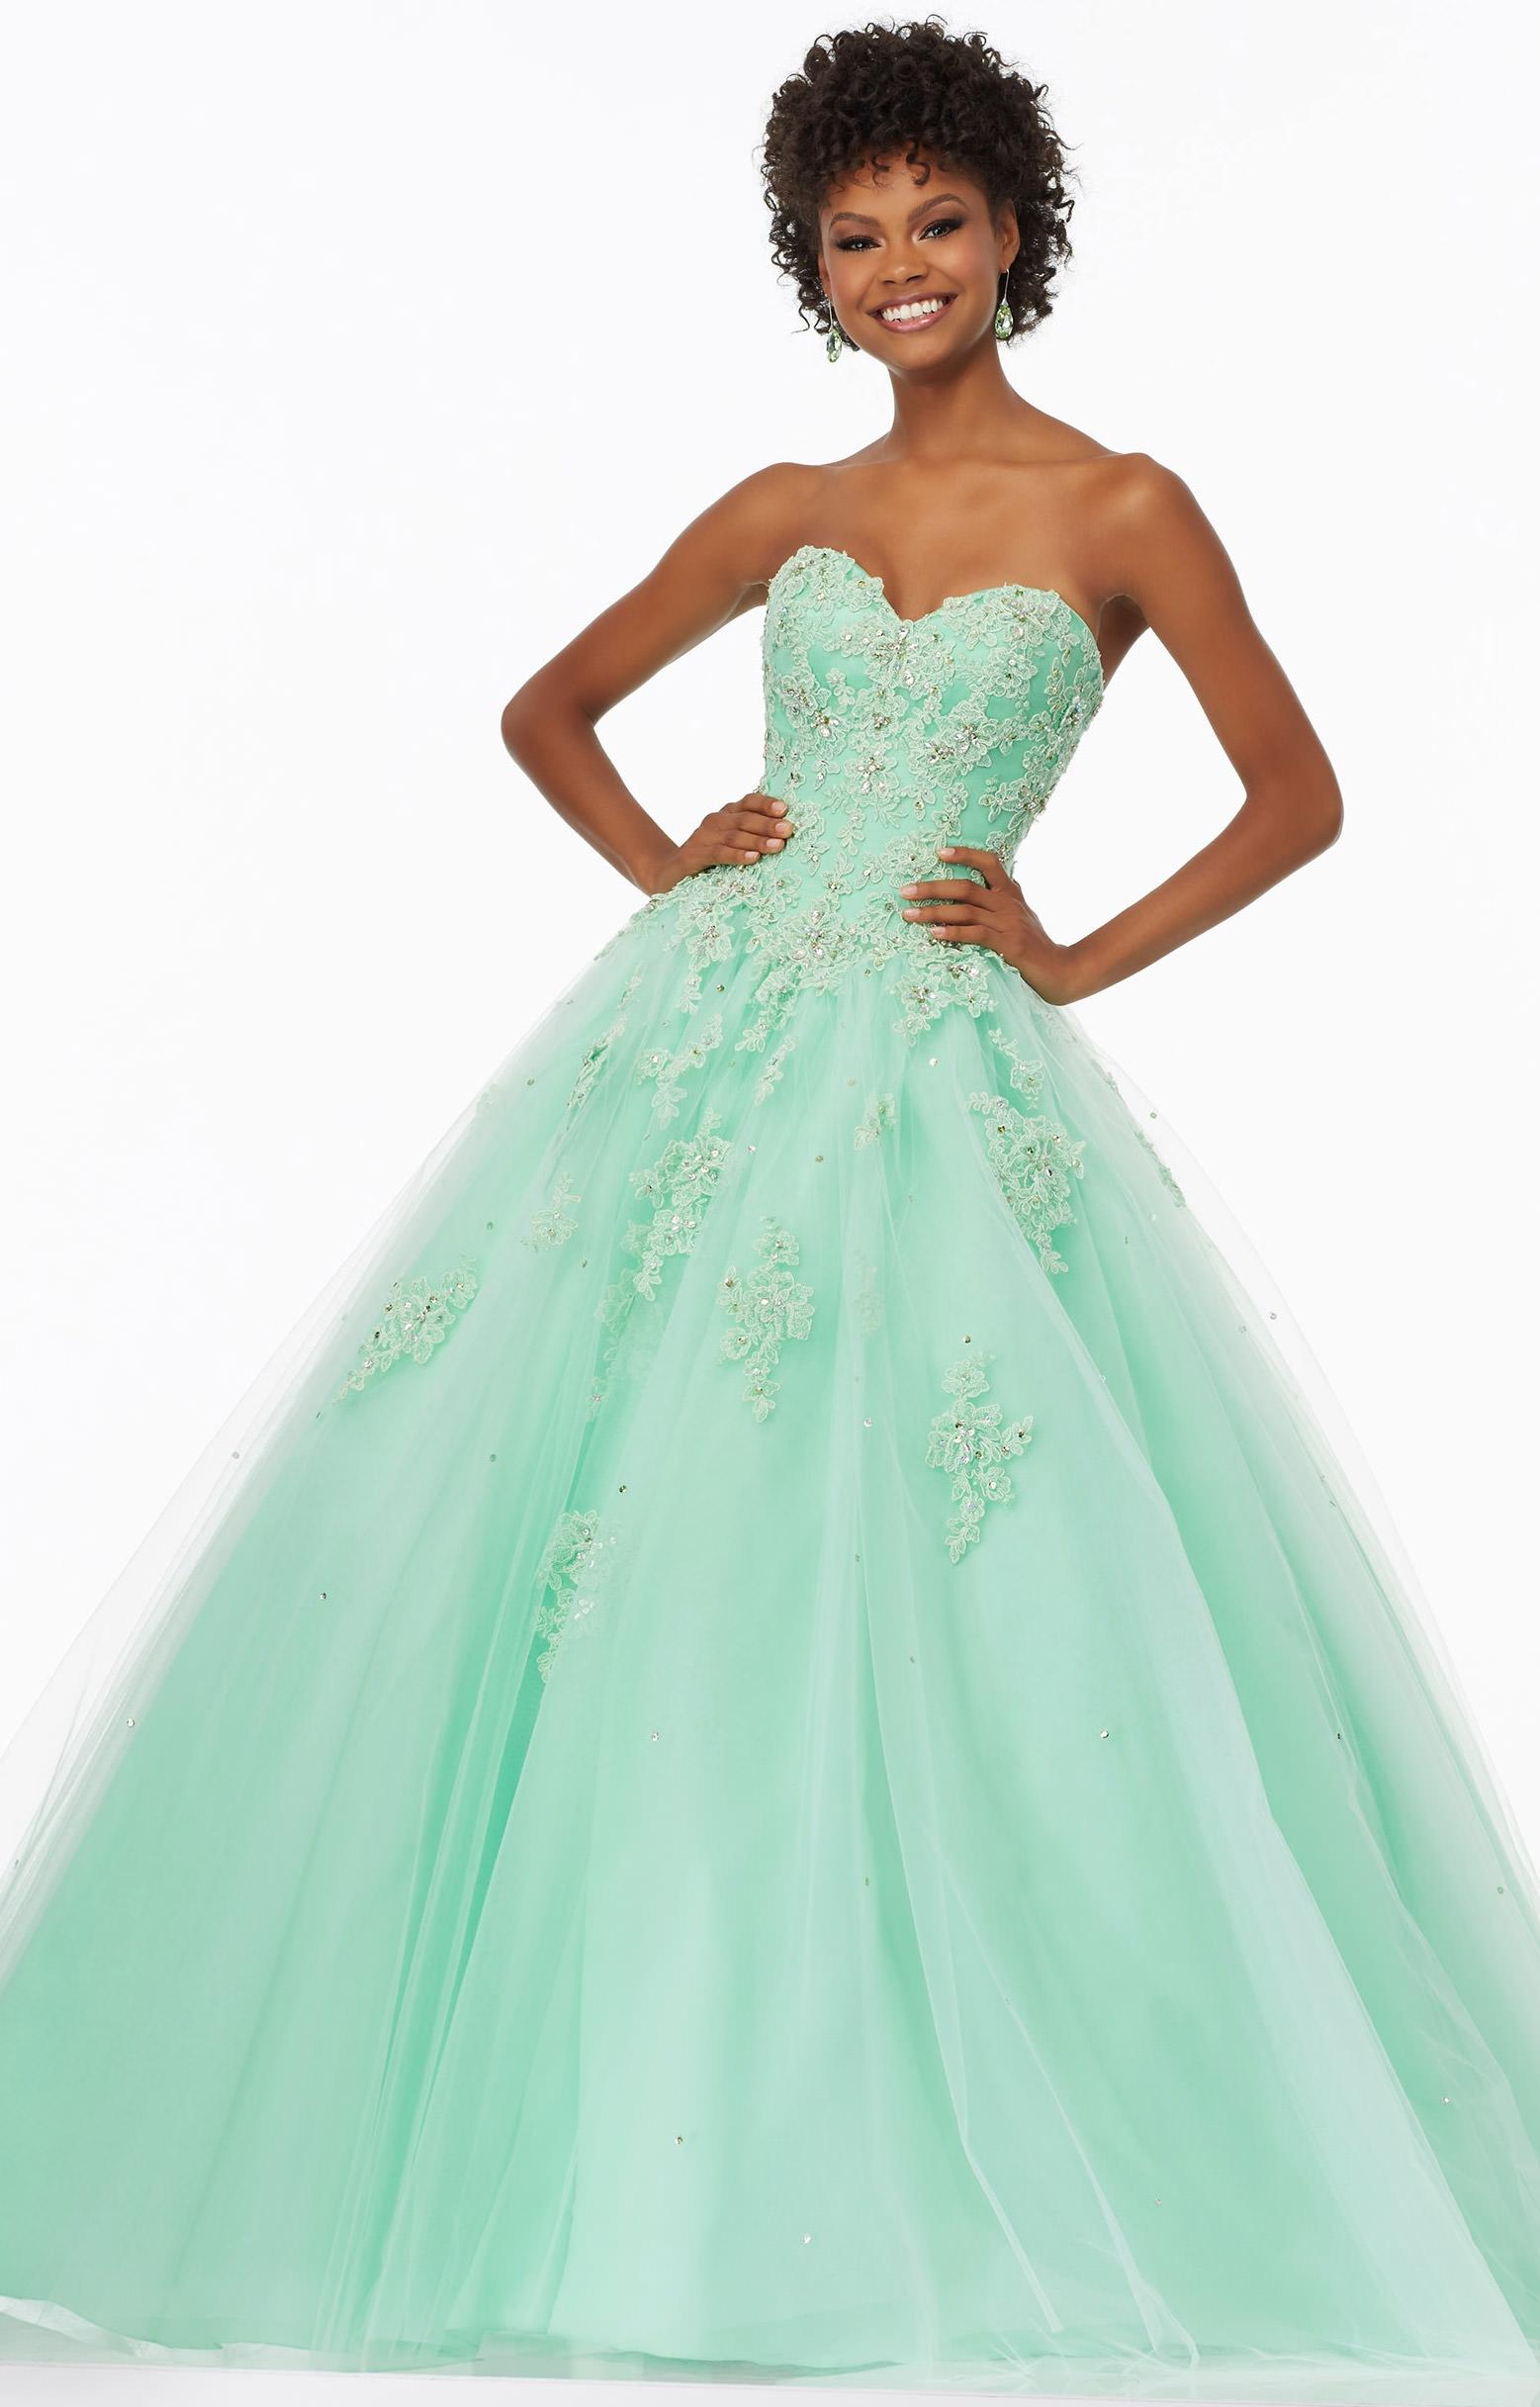 Mori Lee Prom 99137 - Formal Evening Prom Dress